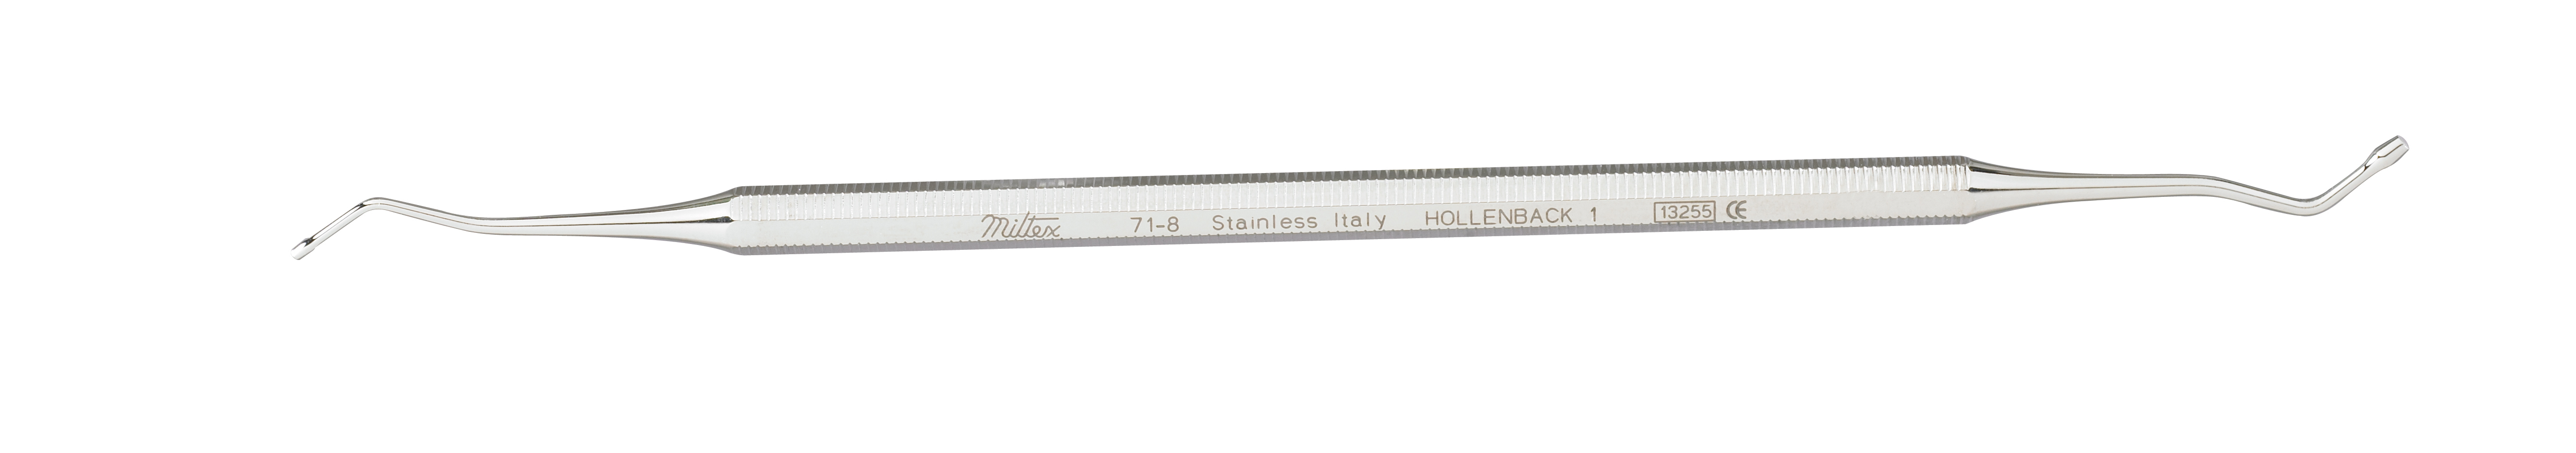 hollenback-plugger-1-de-71-8-miltex.jpg